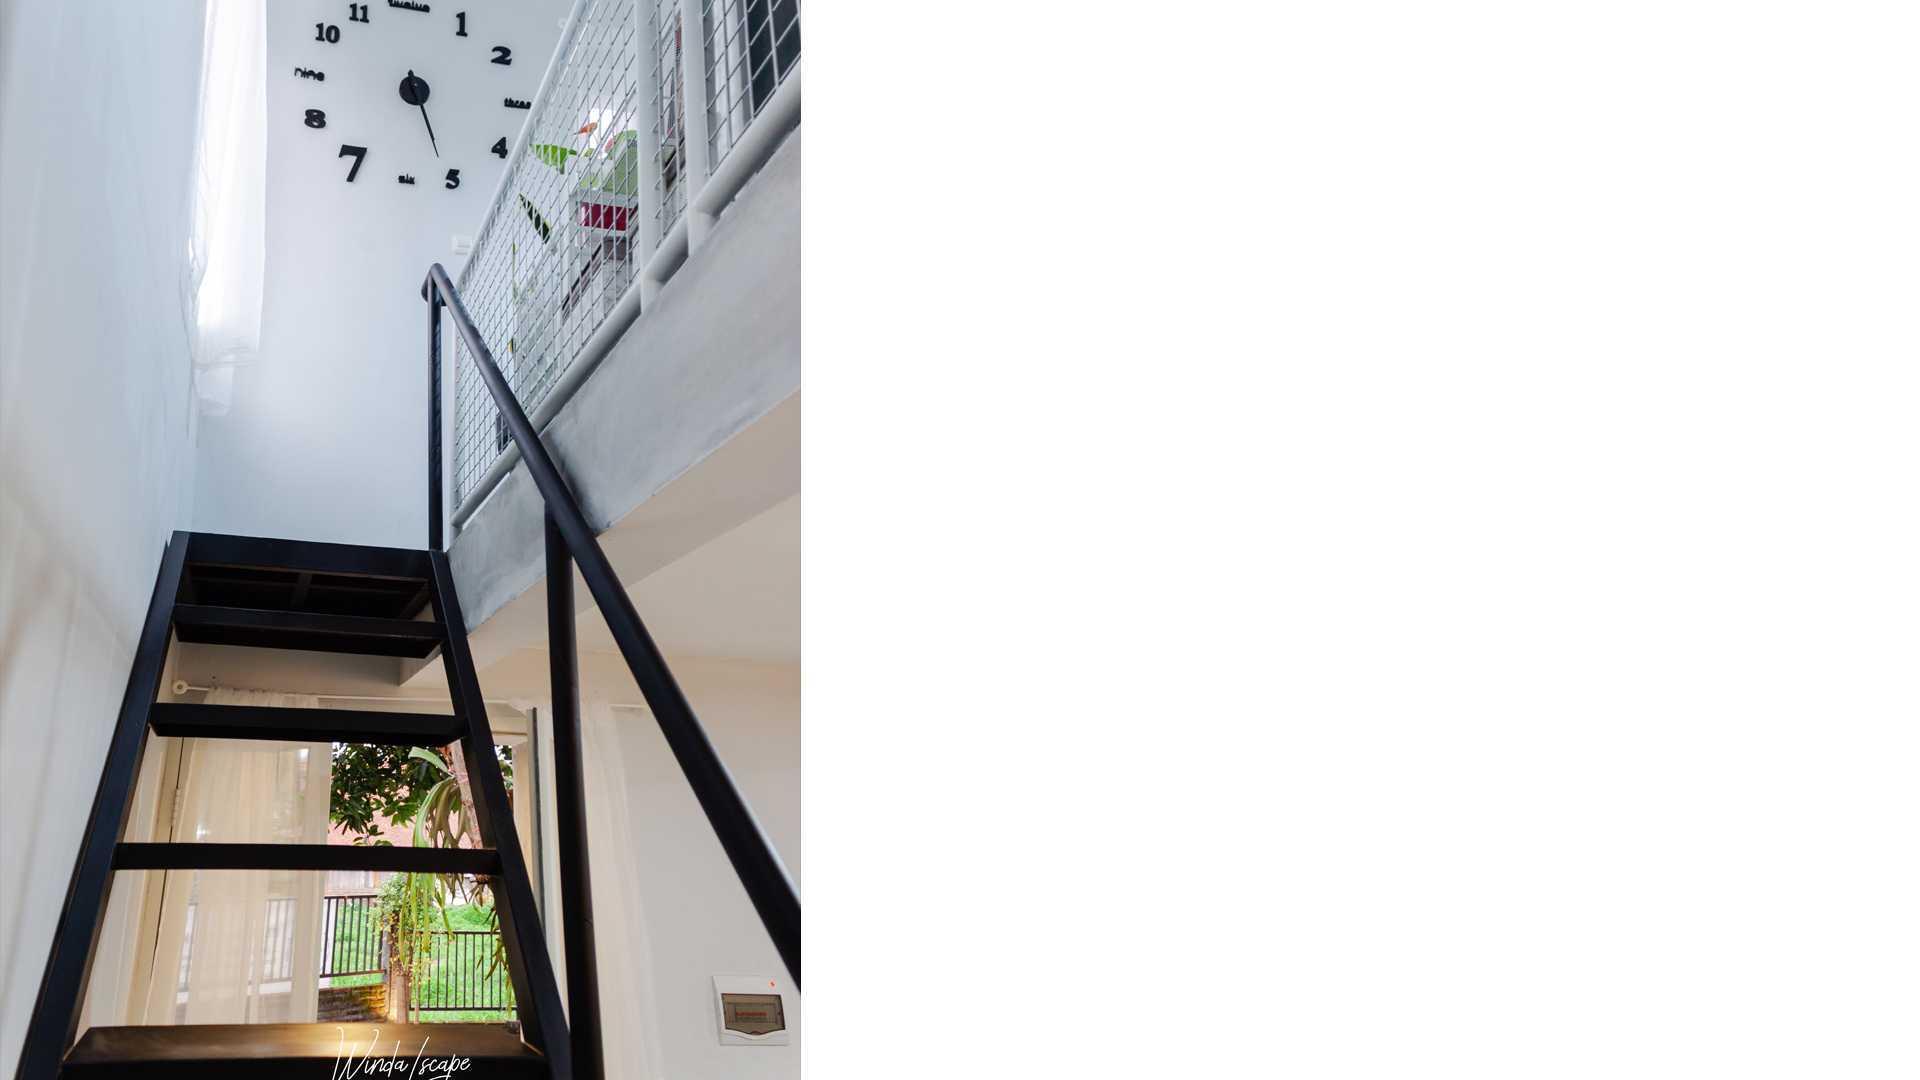 Mr Arsitek G Office | Kantor Mungil Di Semarang Jl. Sendang Pakel I No.30, Gedawang, Kec. Banyumanik, Kota Semarang, Jawa Tengah 50266, Indonesia Jl. Sendang Pakel I No.30, Gedawang, Kec. Banyumanik, Kota Semarang, Jawa Tengah 50266, Indonesia Mr-Arsitek-G-Office-Kantor-Mungil-Di-Semarang Industrial 108628